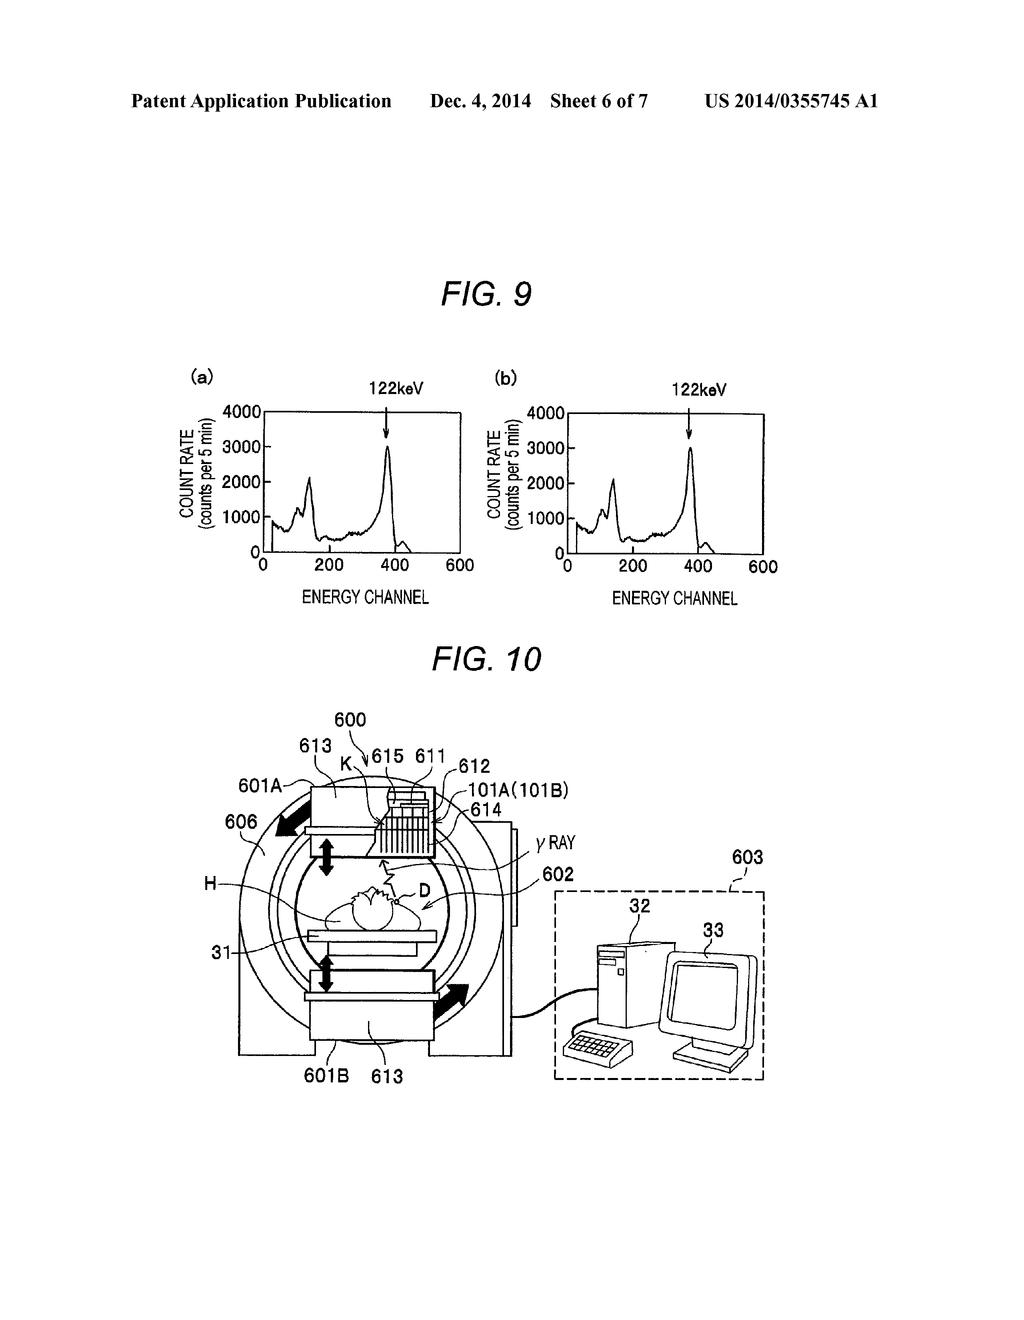 Awe Inspiring Semiconductor Radiation Detector And Nuclear Medicine Diagnosis Wiring Database Apannorabwedabyuccorg